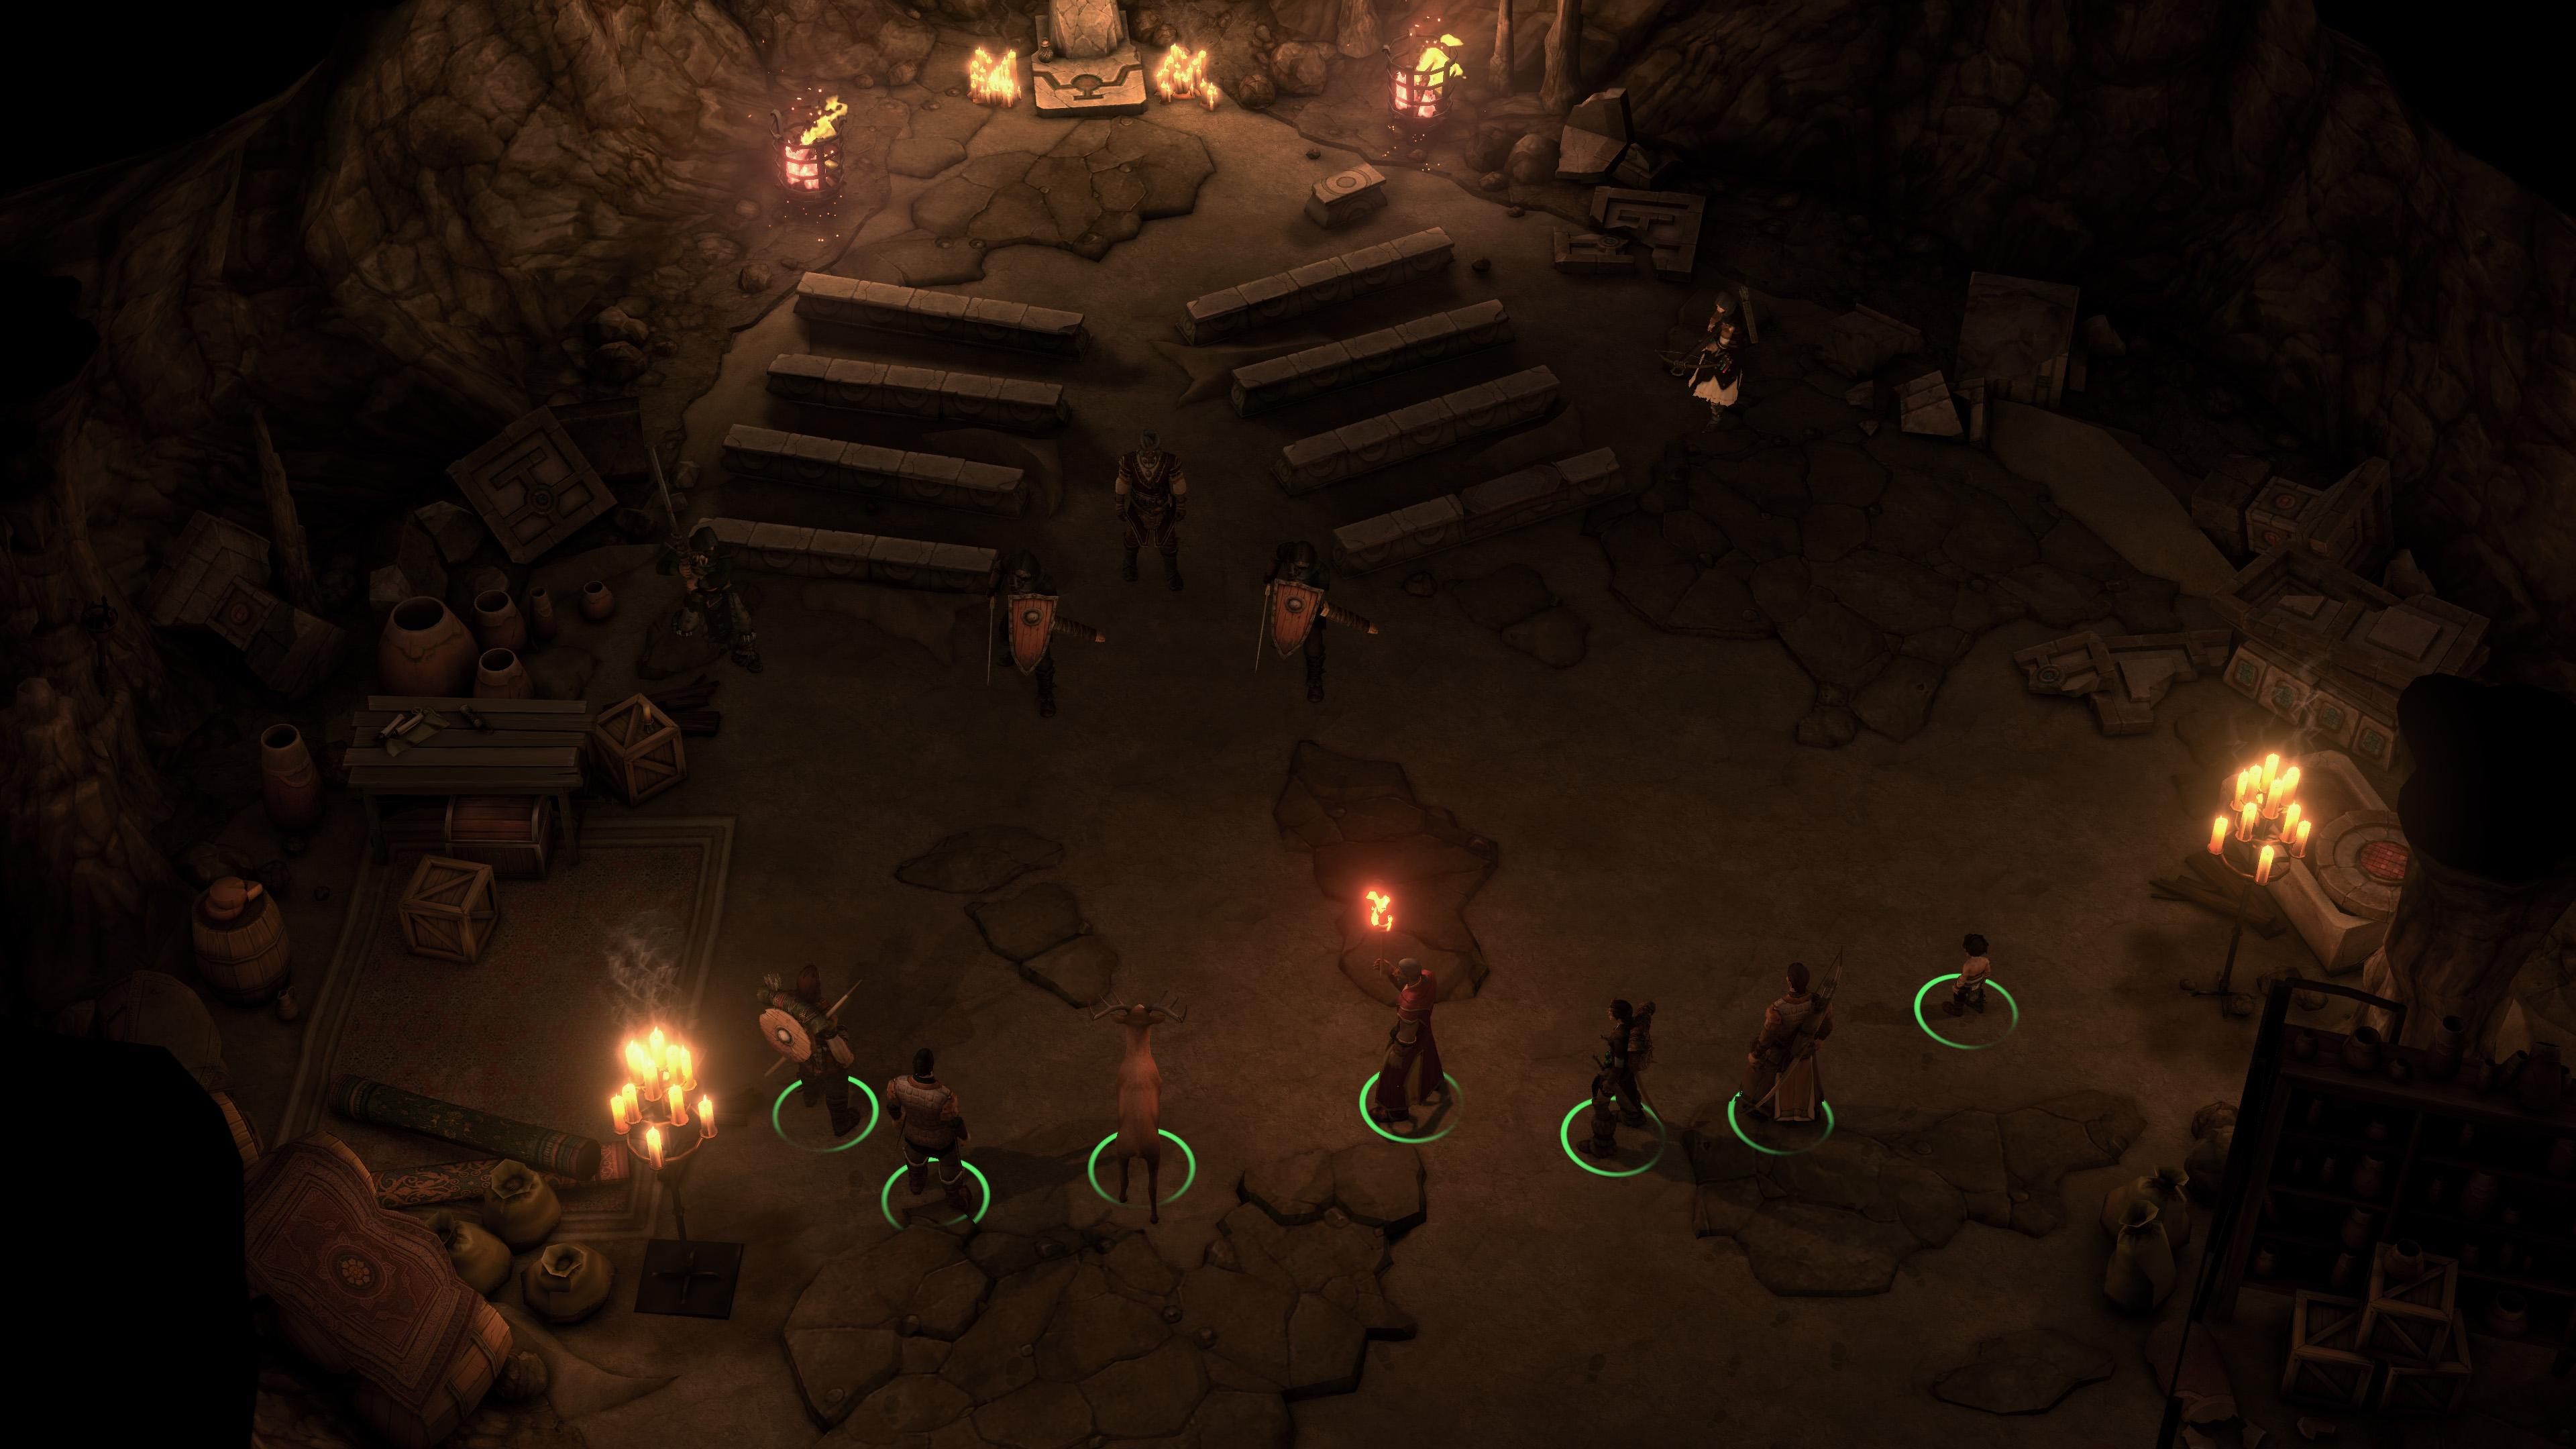 Pathfinder: Kingmaker's second DLC, Varnhold's Lot, releases